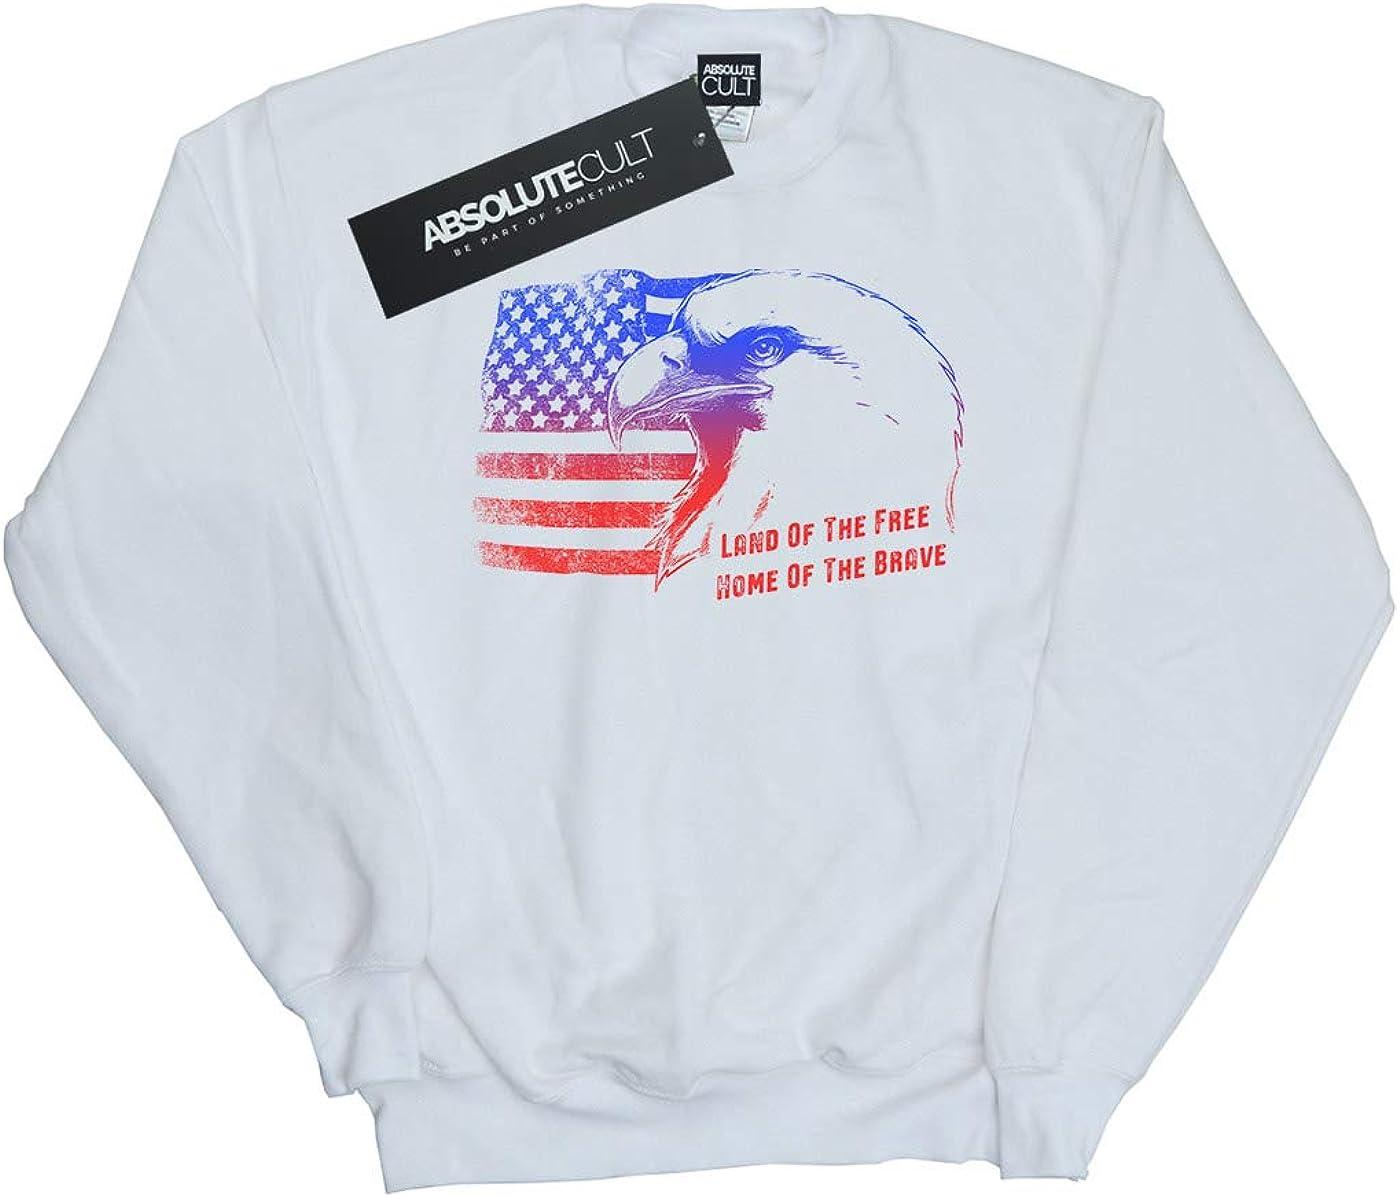 ABSOLUTECULT Drewbacca Girls American Dream Sweatshirt